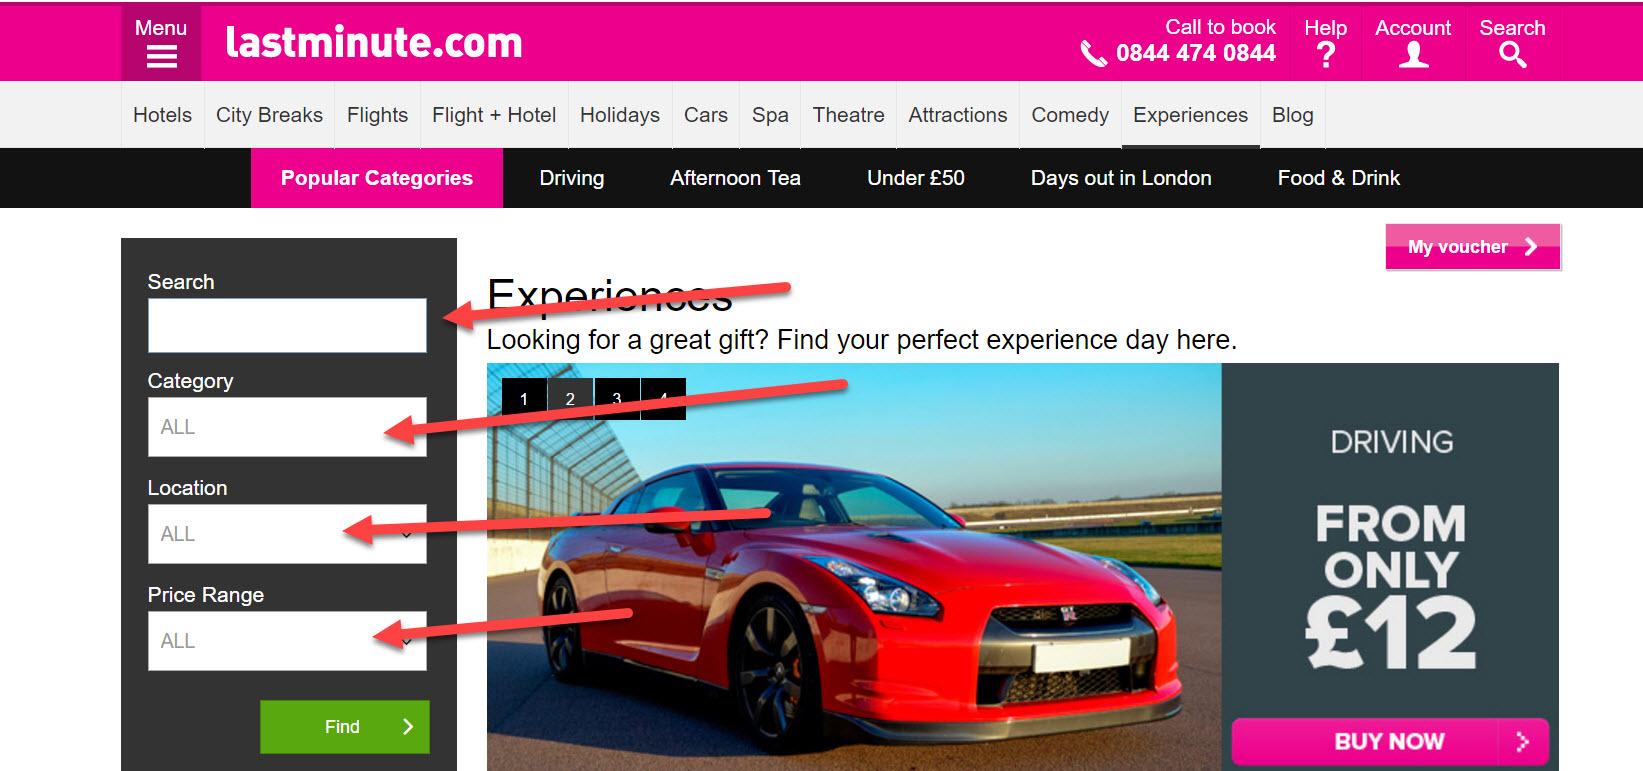 lastminute.com experiences